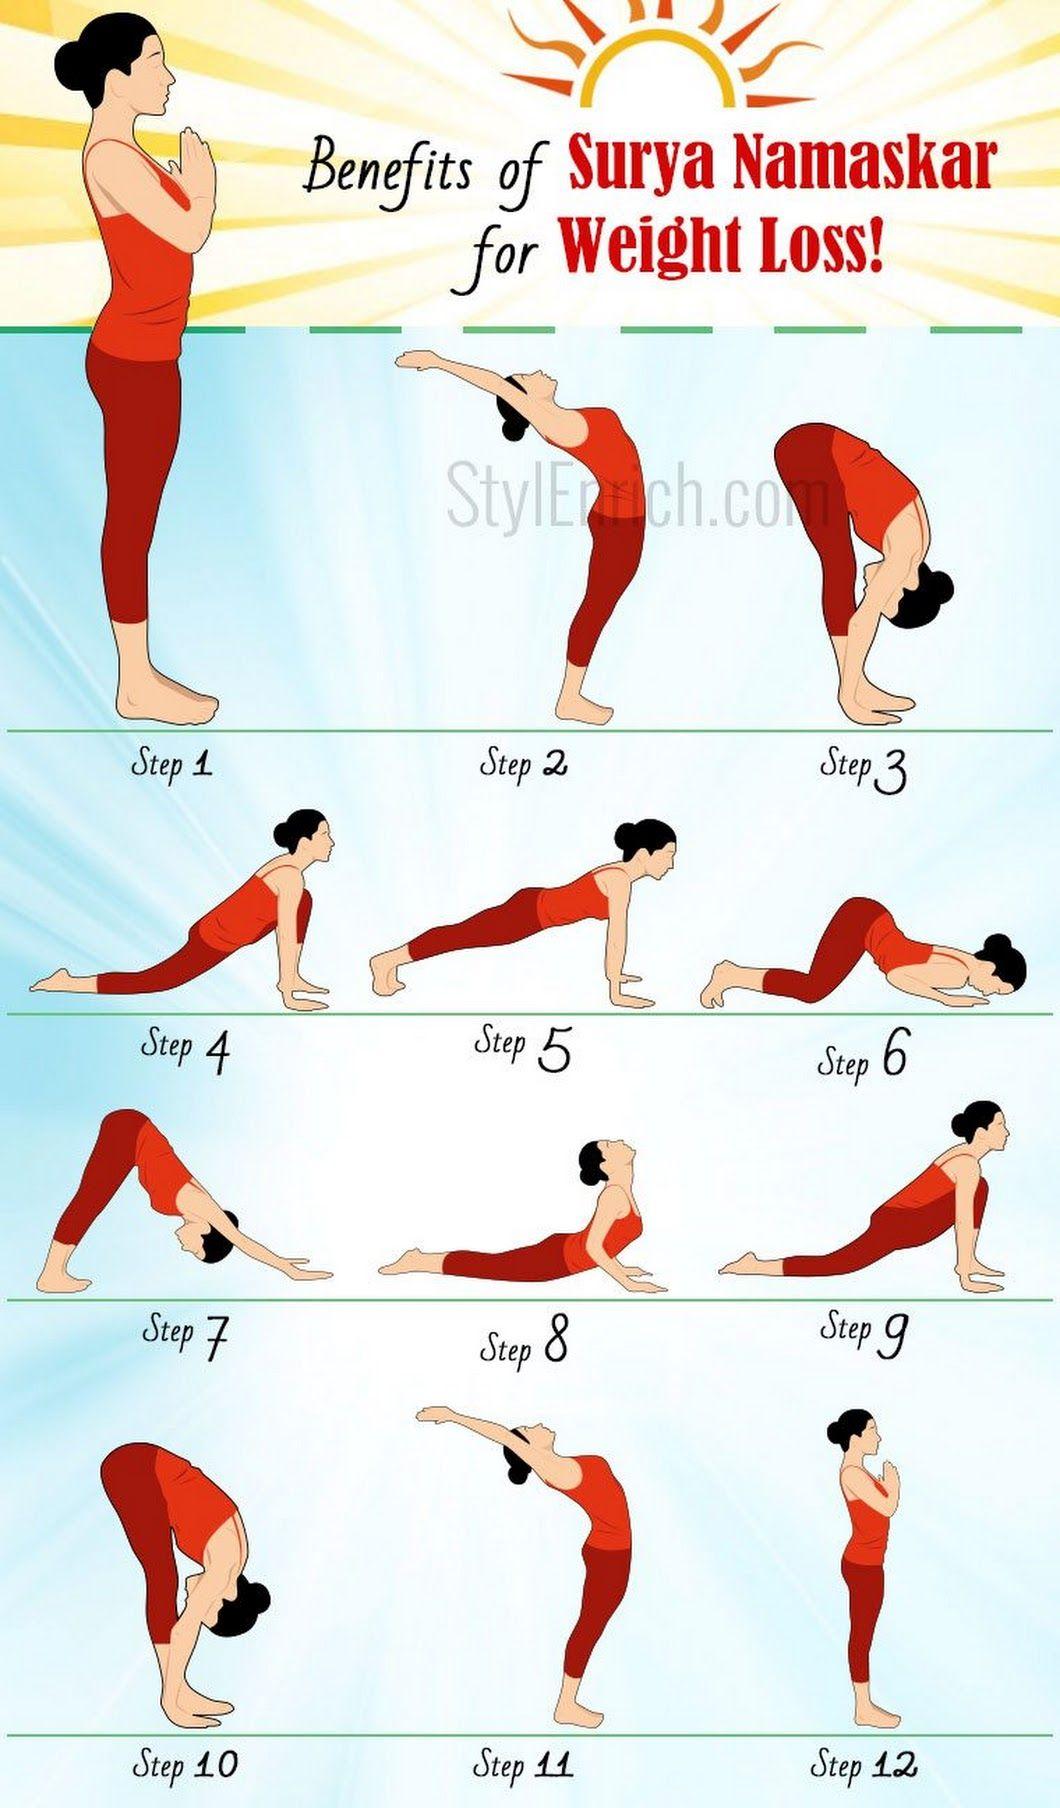 Yoga For Weight Loss Surya Namaskar Benefits